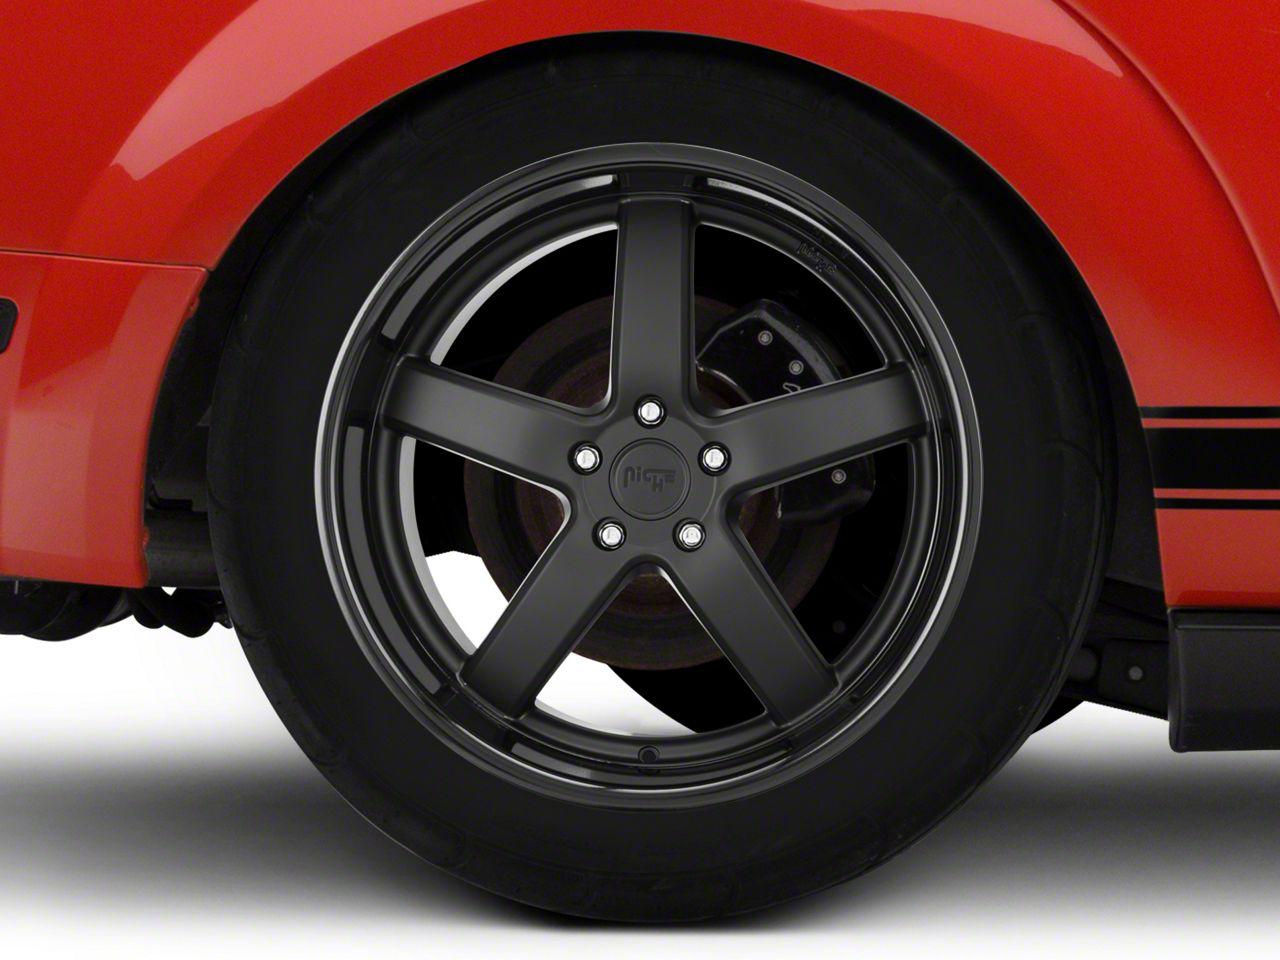 Niche TMB Matte Black Wheel - Passenger Side - 20x10 - Rear Only (05-14 All)